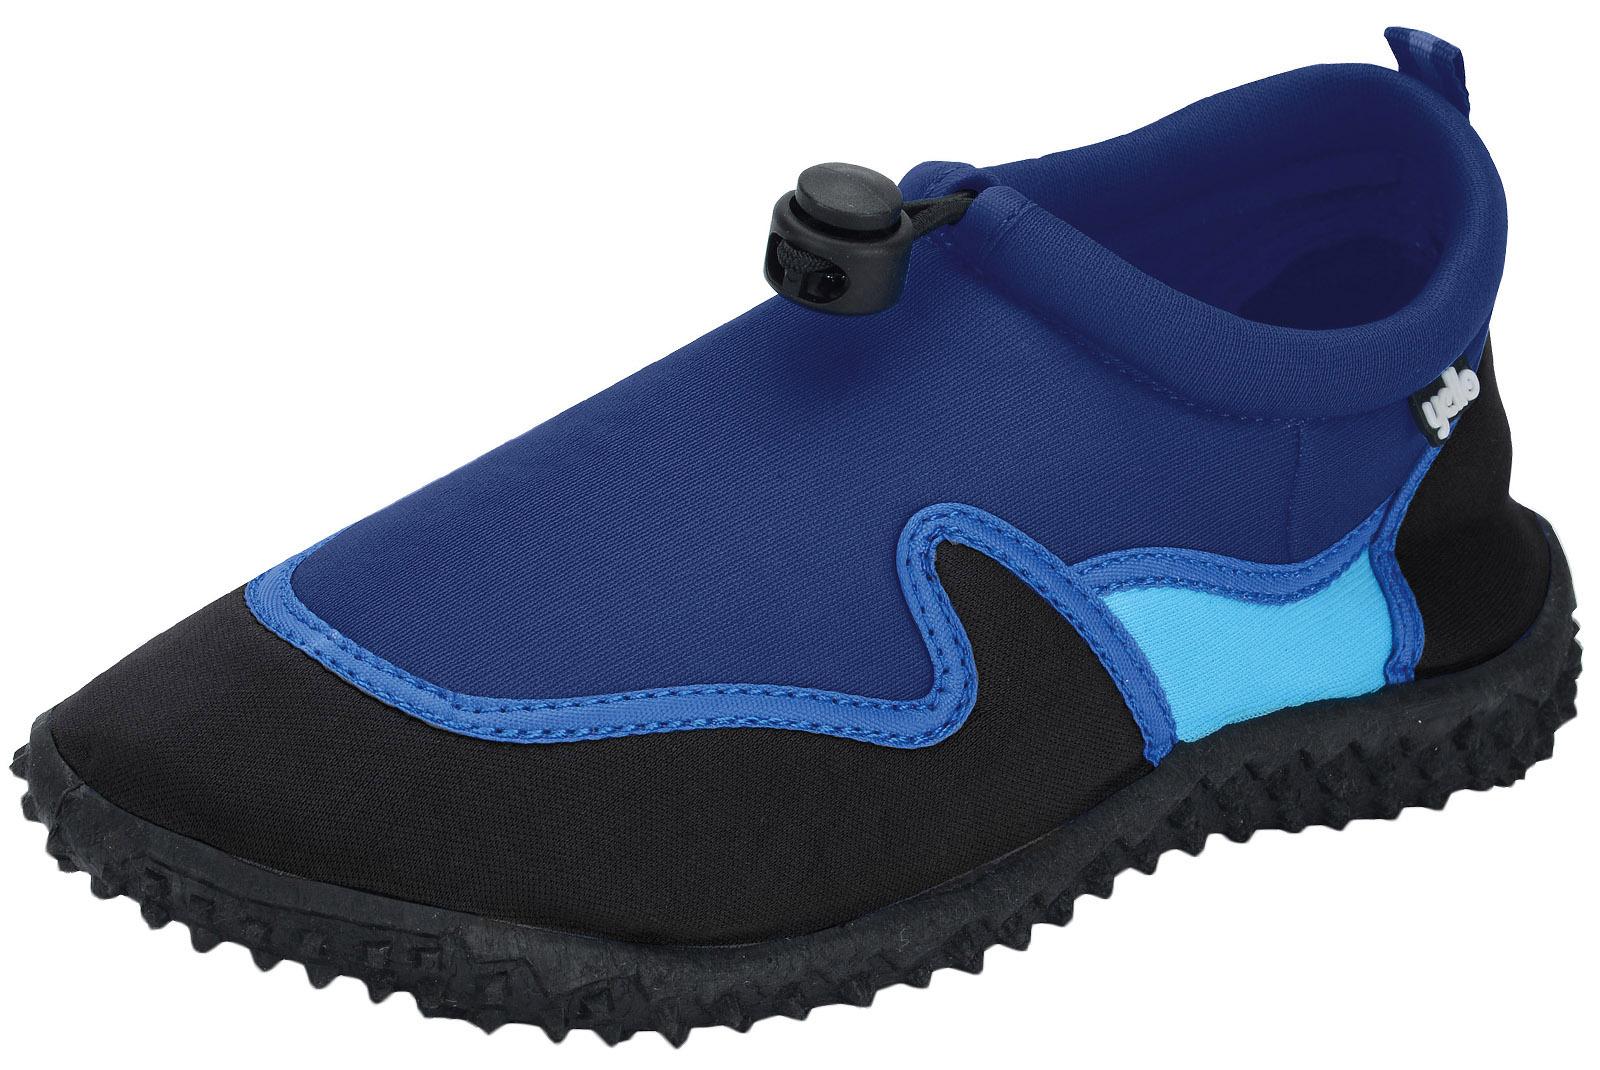 Mens Aqua Socks Beach Swim Surf Scuba Wetsuit Shoes Non Slip Waterproof Sandals